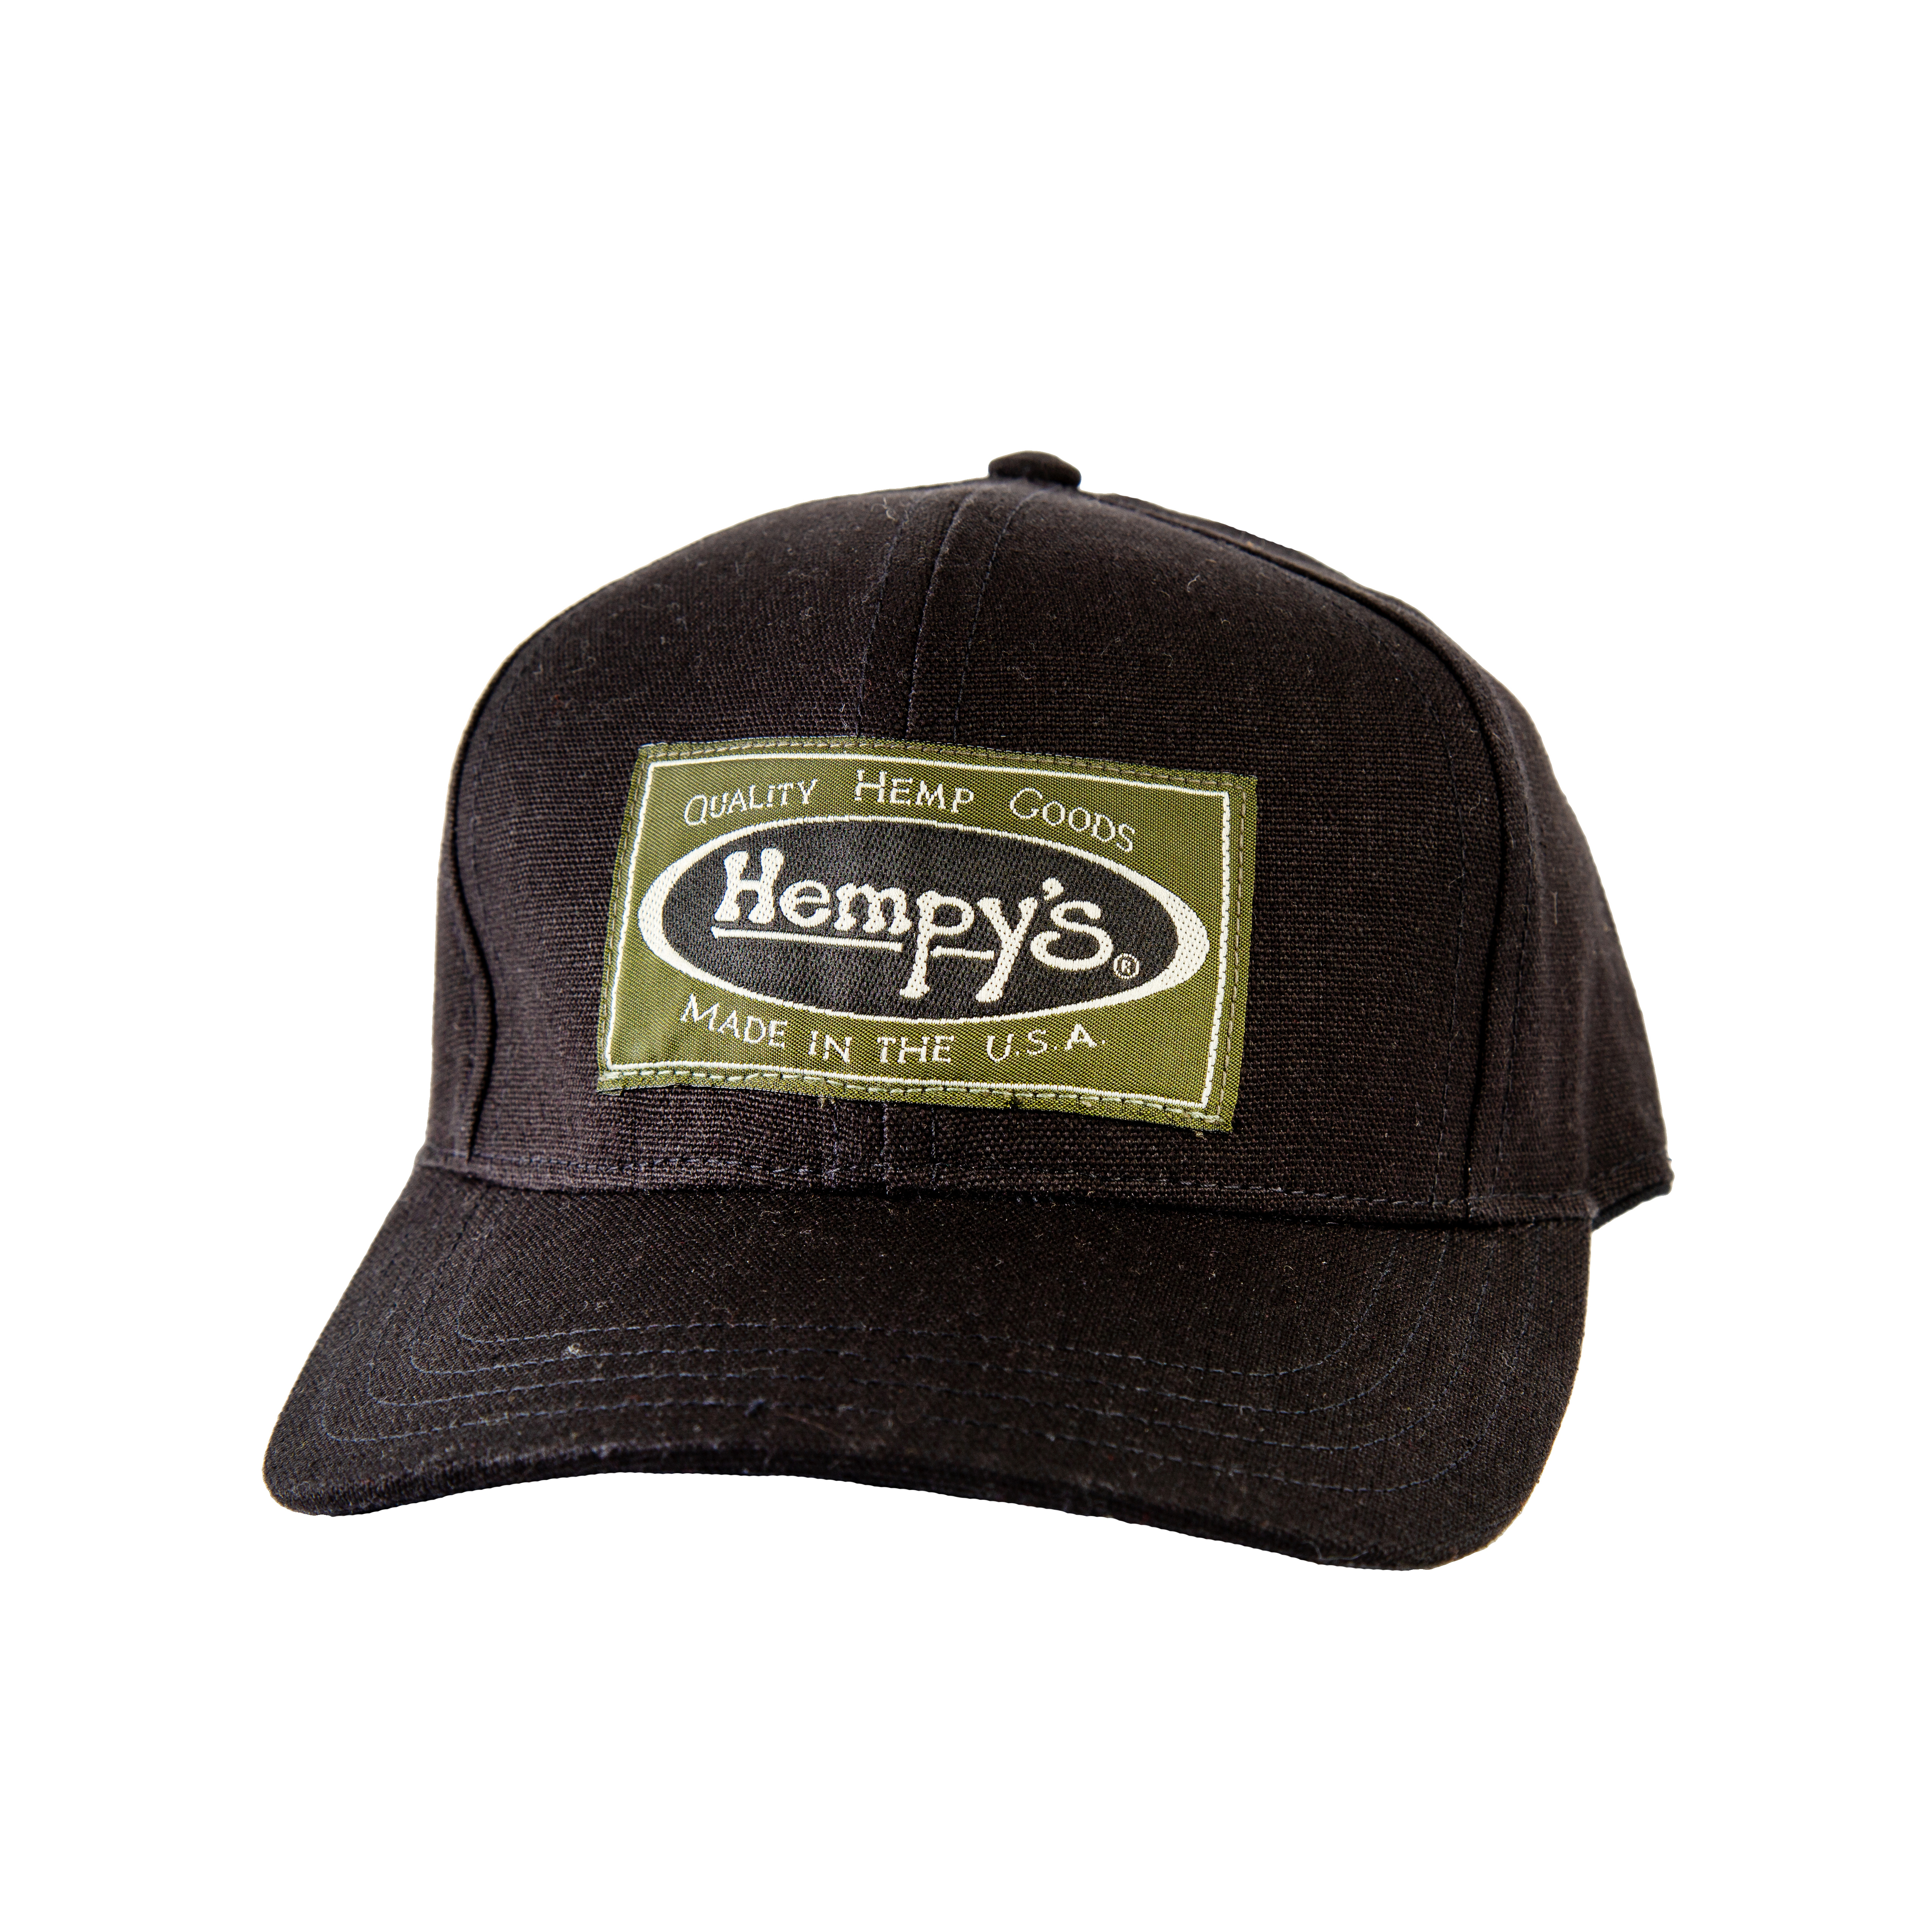 Hemp Vintage Baseball Cap Black - HEMPY S Quality Hemp Goods 25c1b4bb078